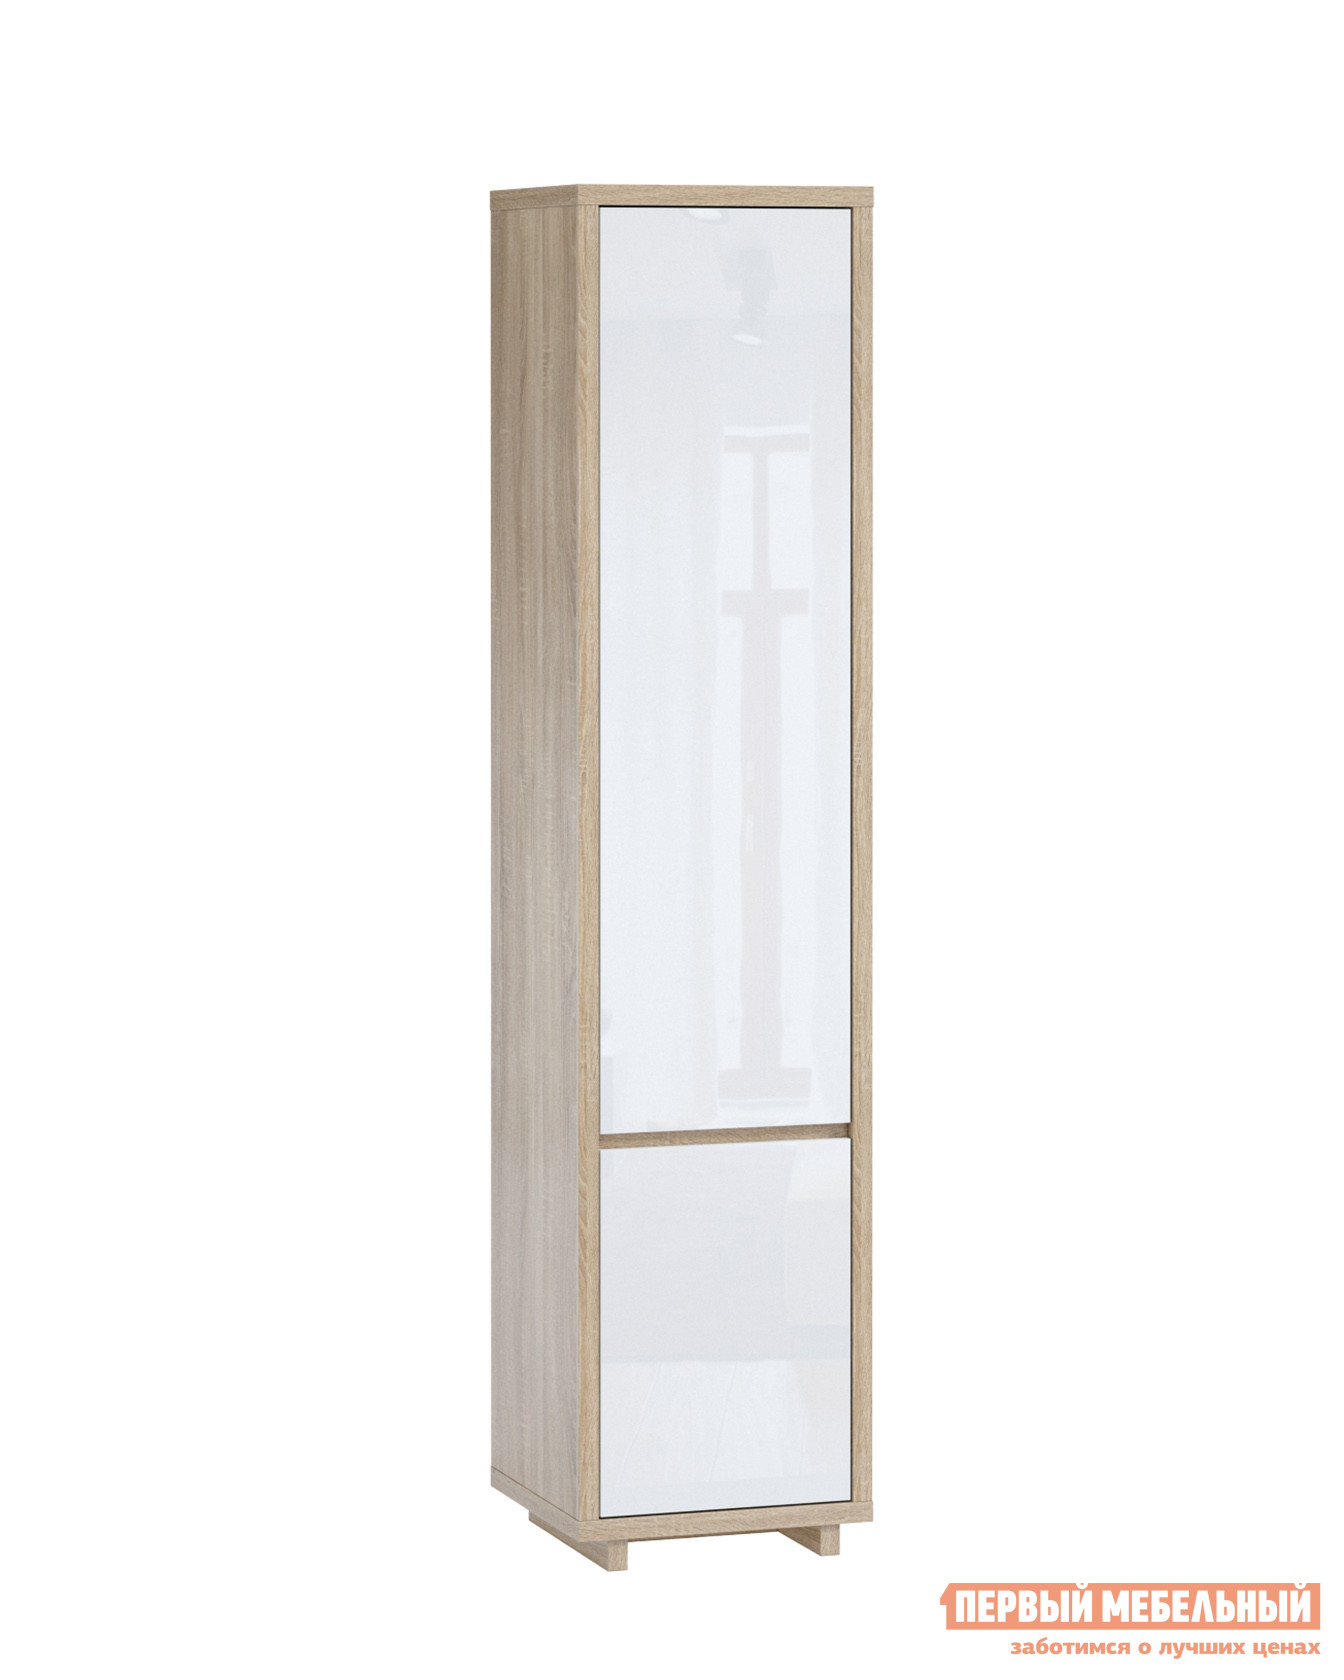 Шкаф распашной  Аспен Шкаф-пенал (2 двери) Дуб Сонома / Белый глянец